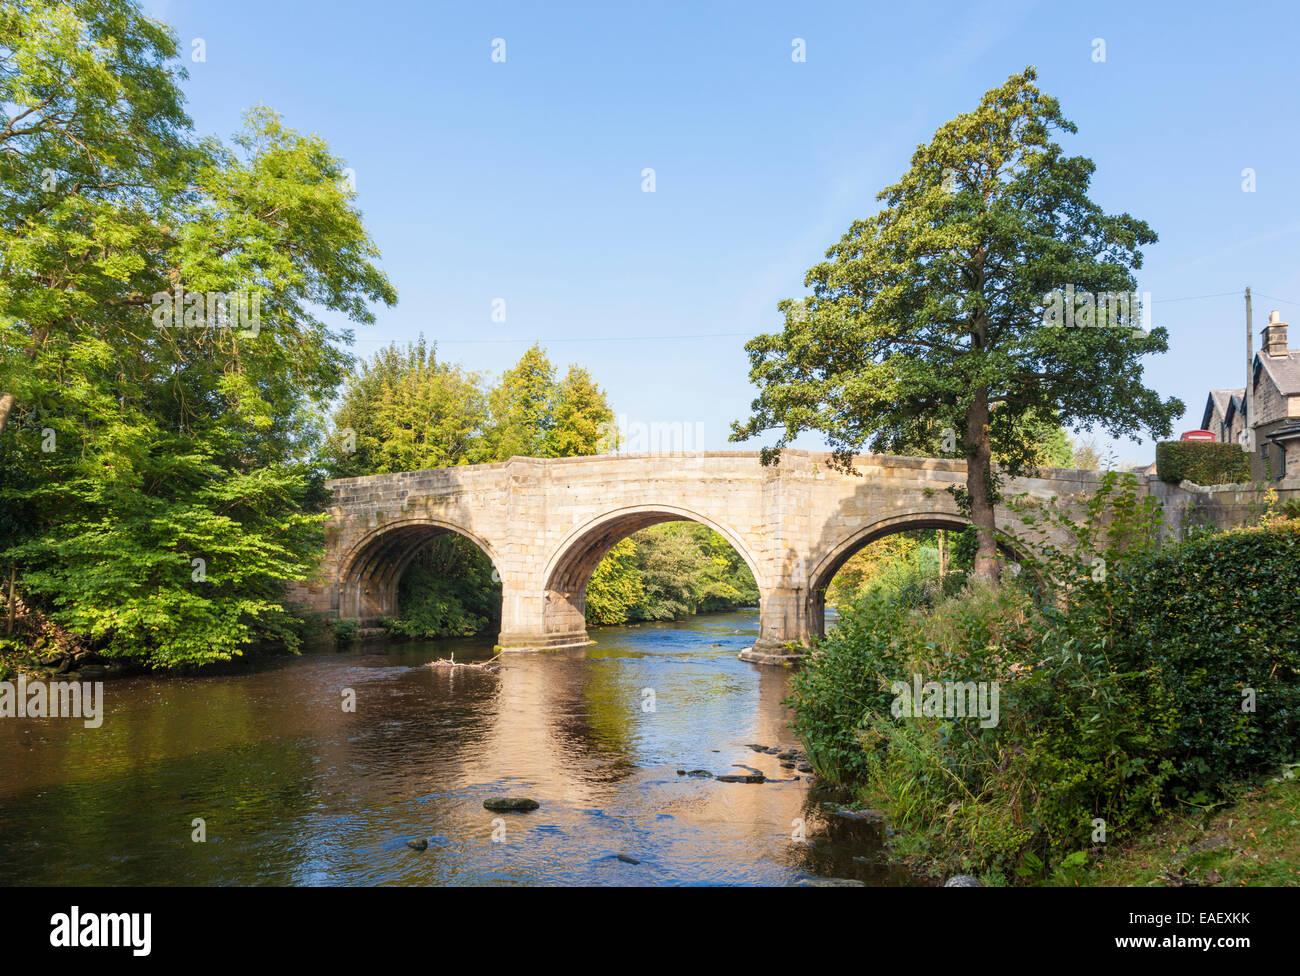 Bubnell Bridge over the River Derwent in the Peak District village of Baslow, Derbyshire, England, UK - Stock Image